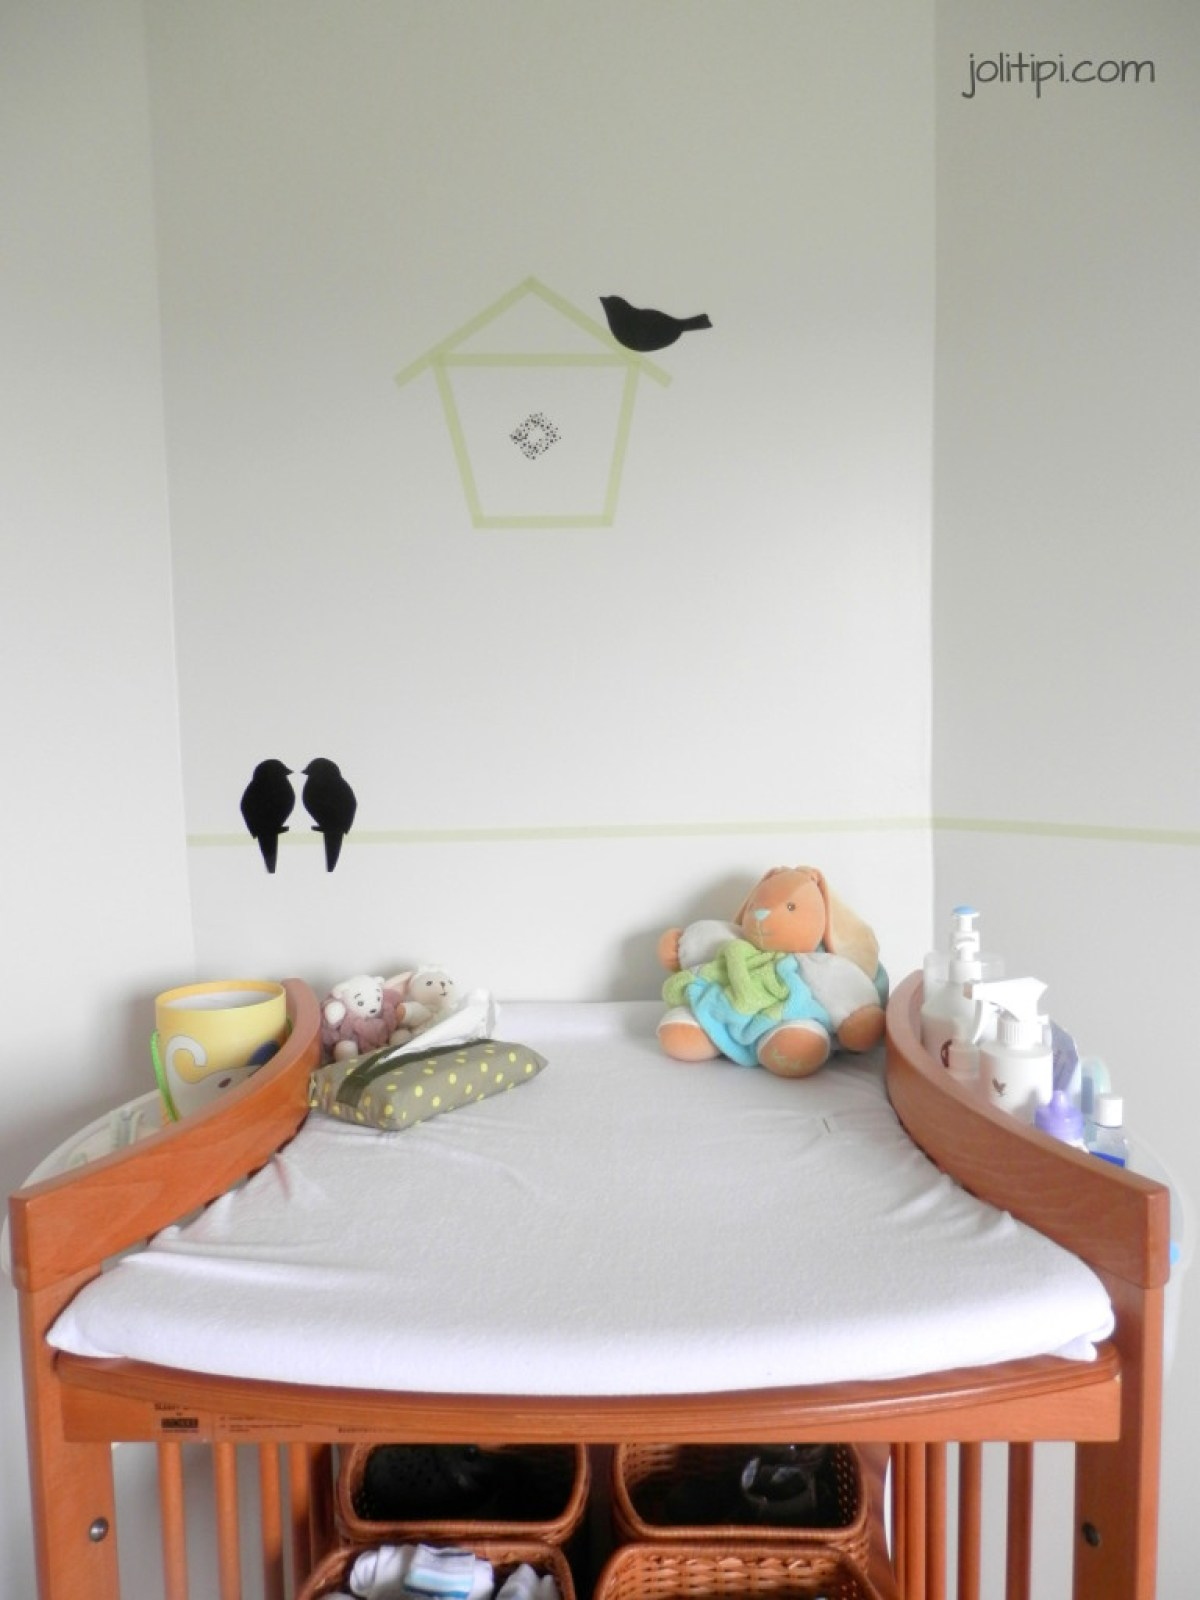 chambre bébé garçon_jolitipi.com